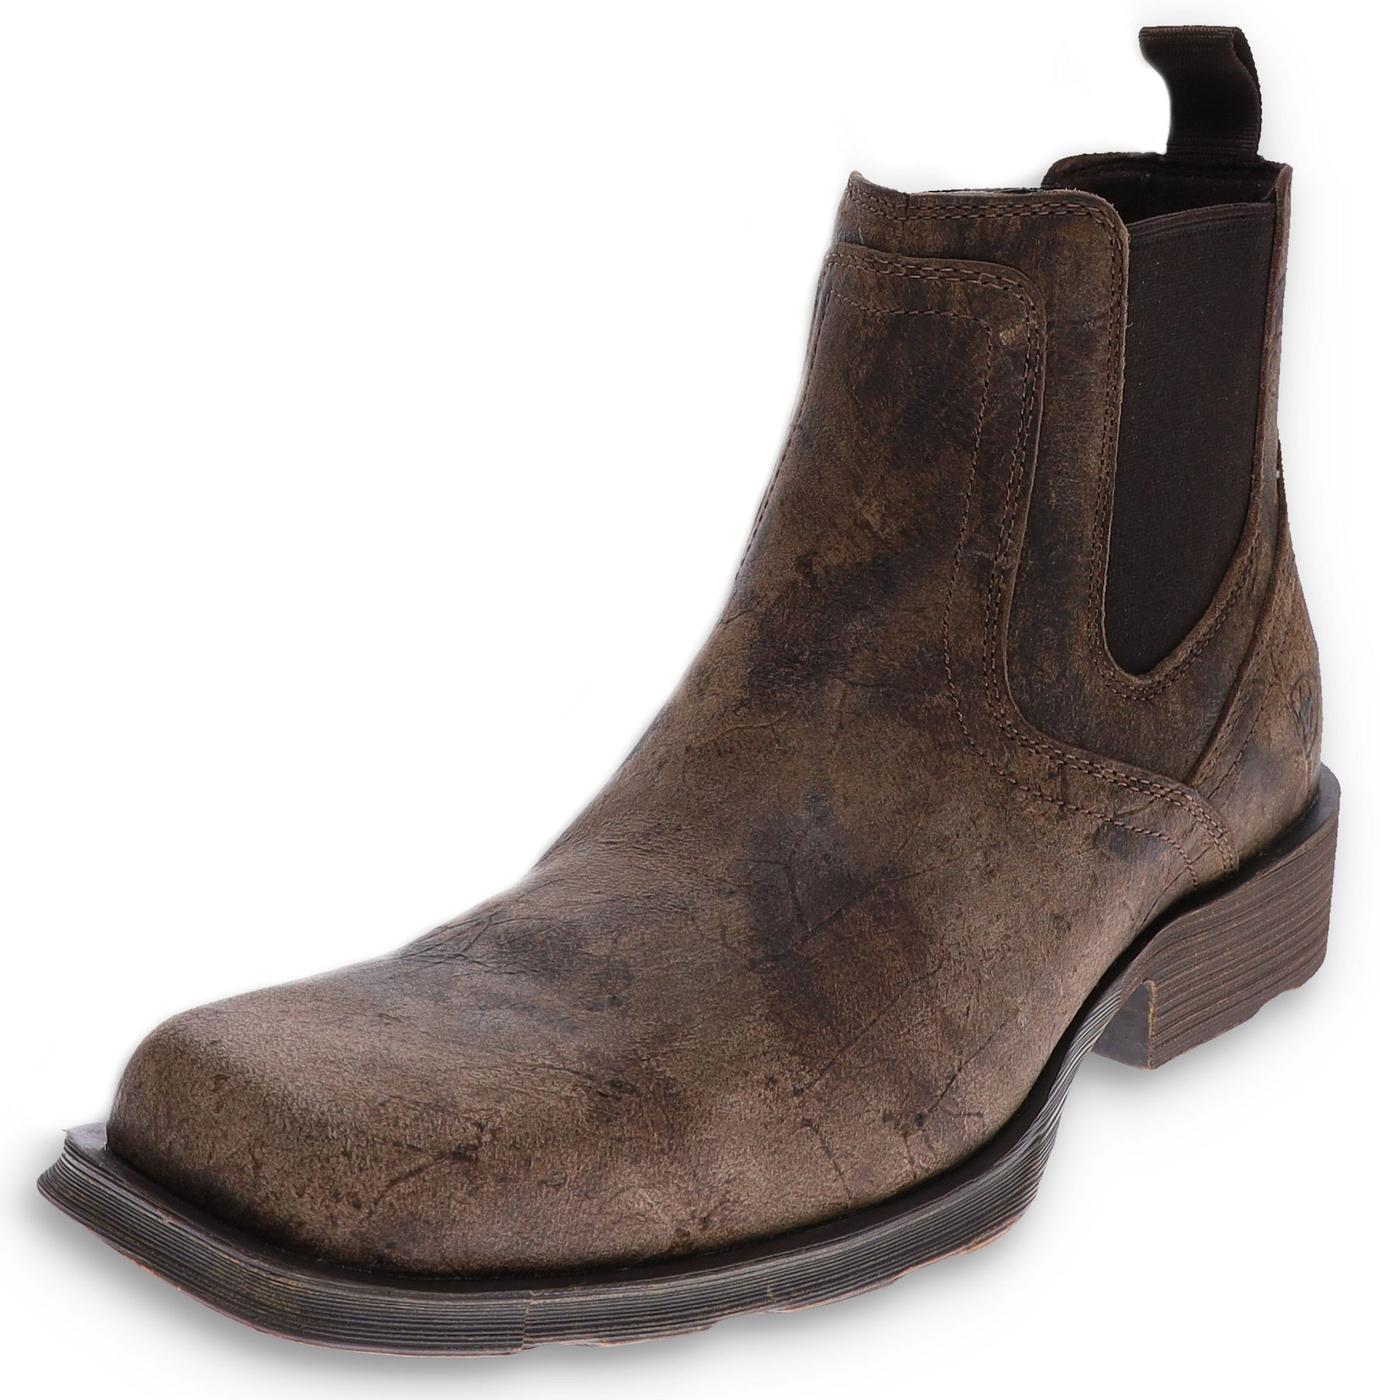 Ariat 31635 MIDTOWN RAMBLER Stone men's western ankle boot - brown